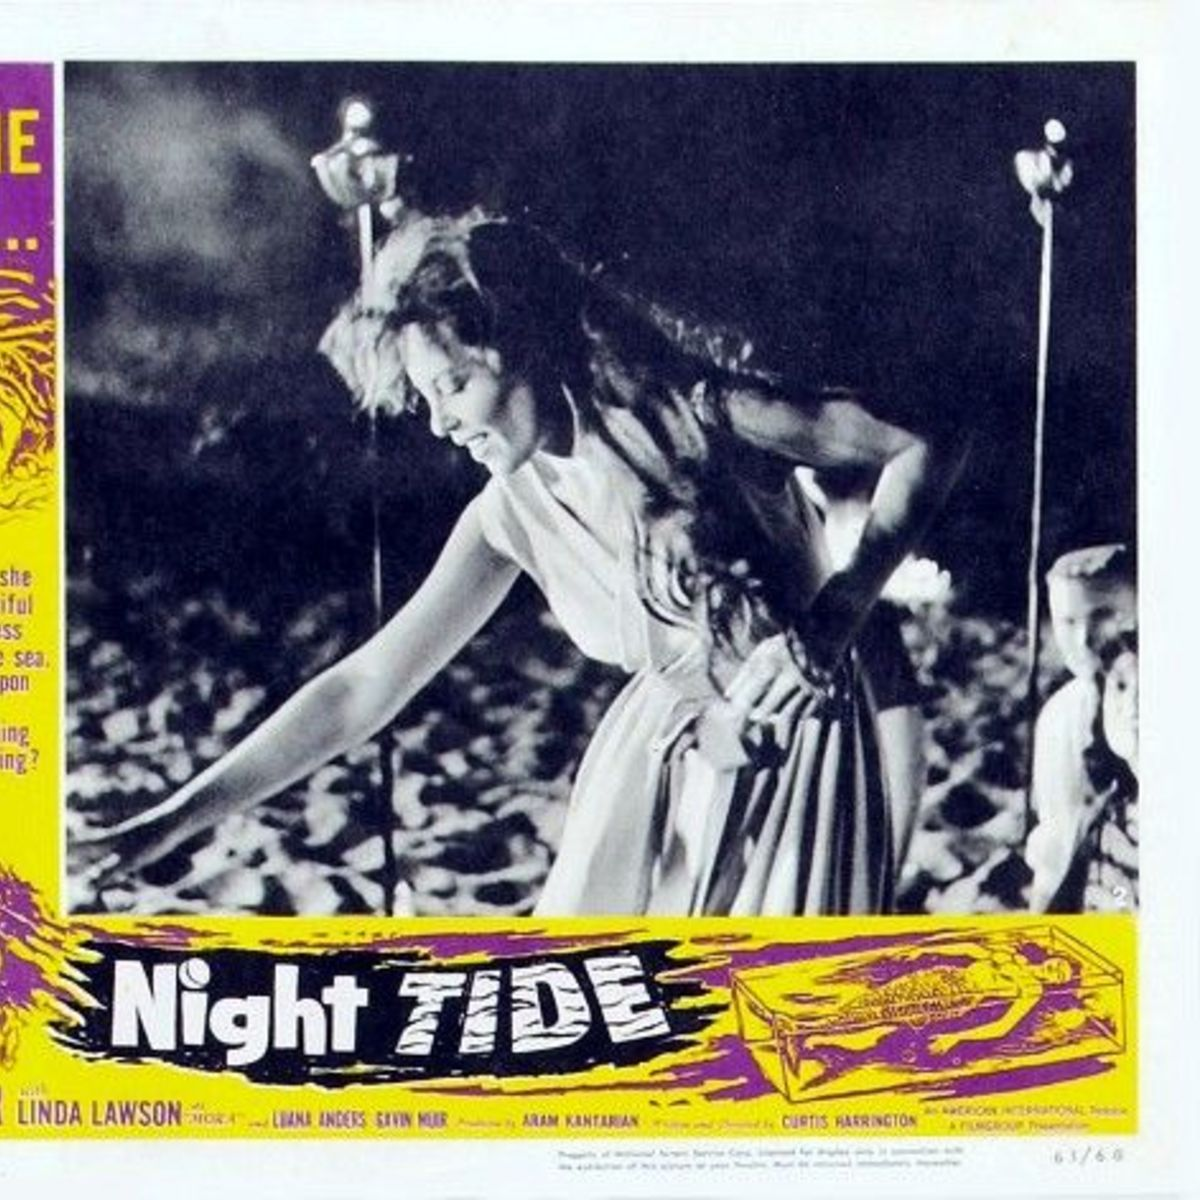 Night Tide Lobby Card